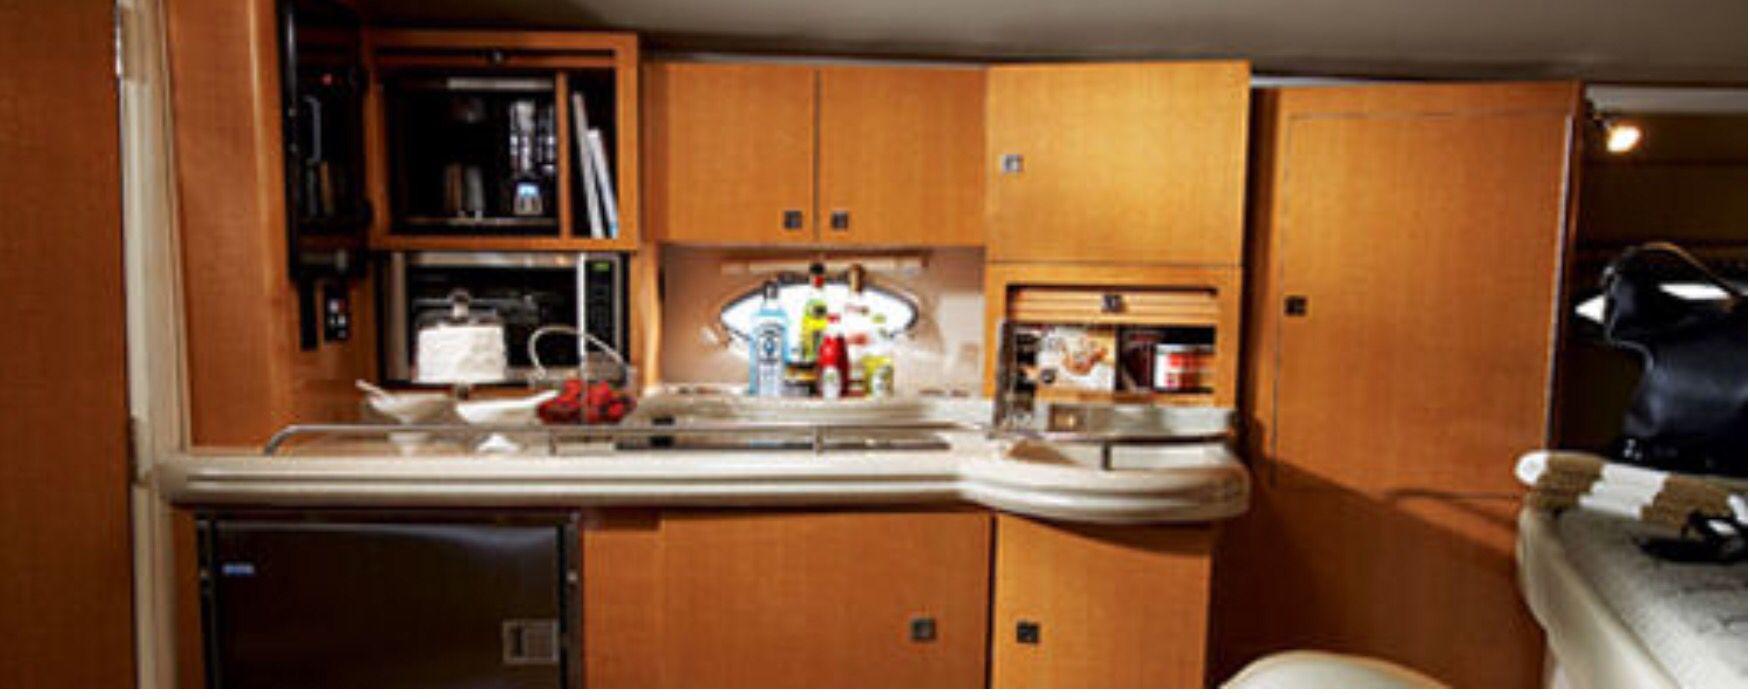 Galley   Kitchen cabinets, Cabin cruiser, Home decor